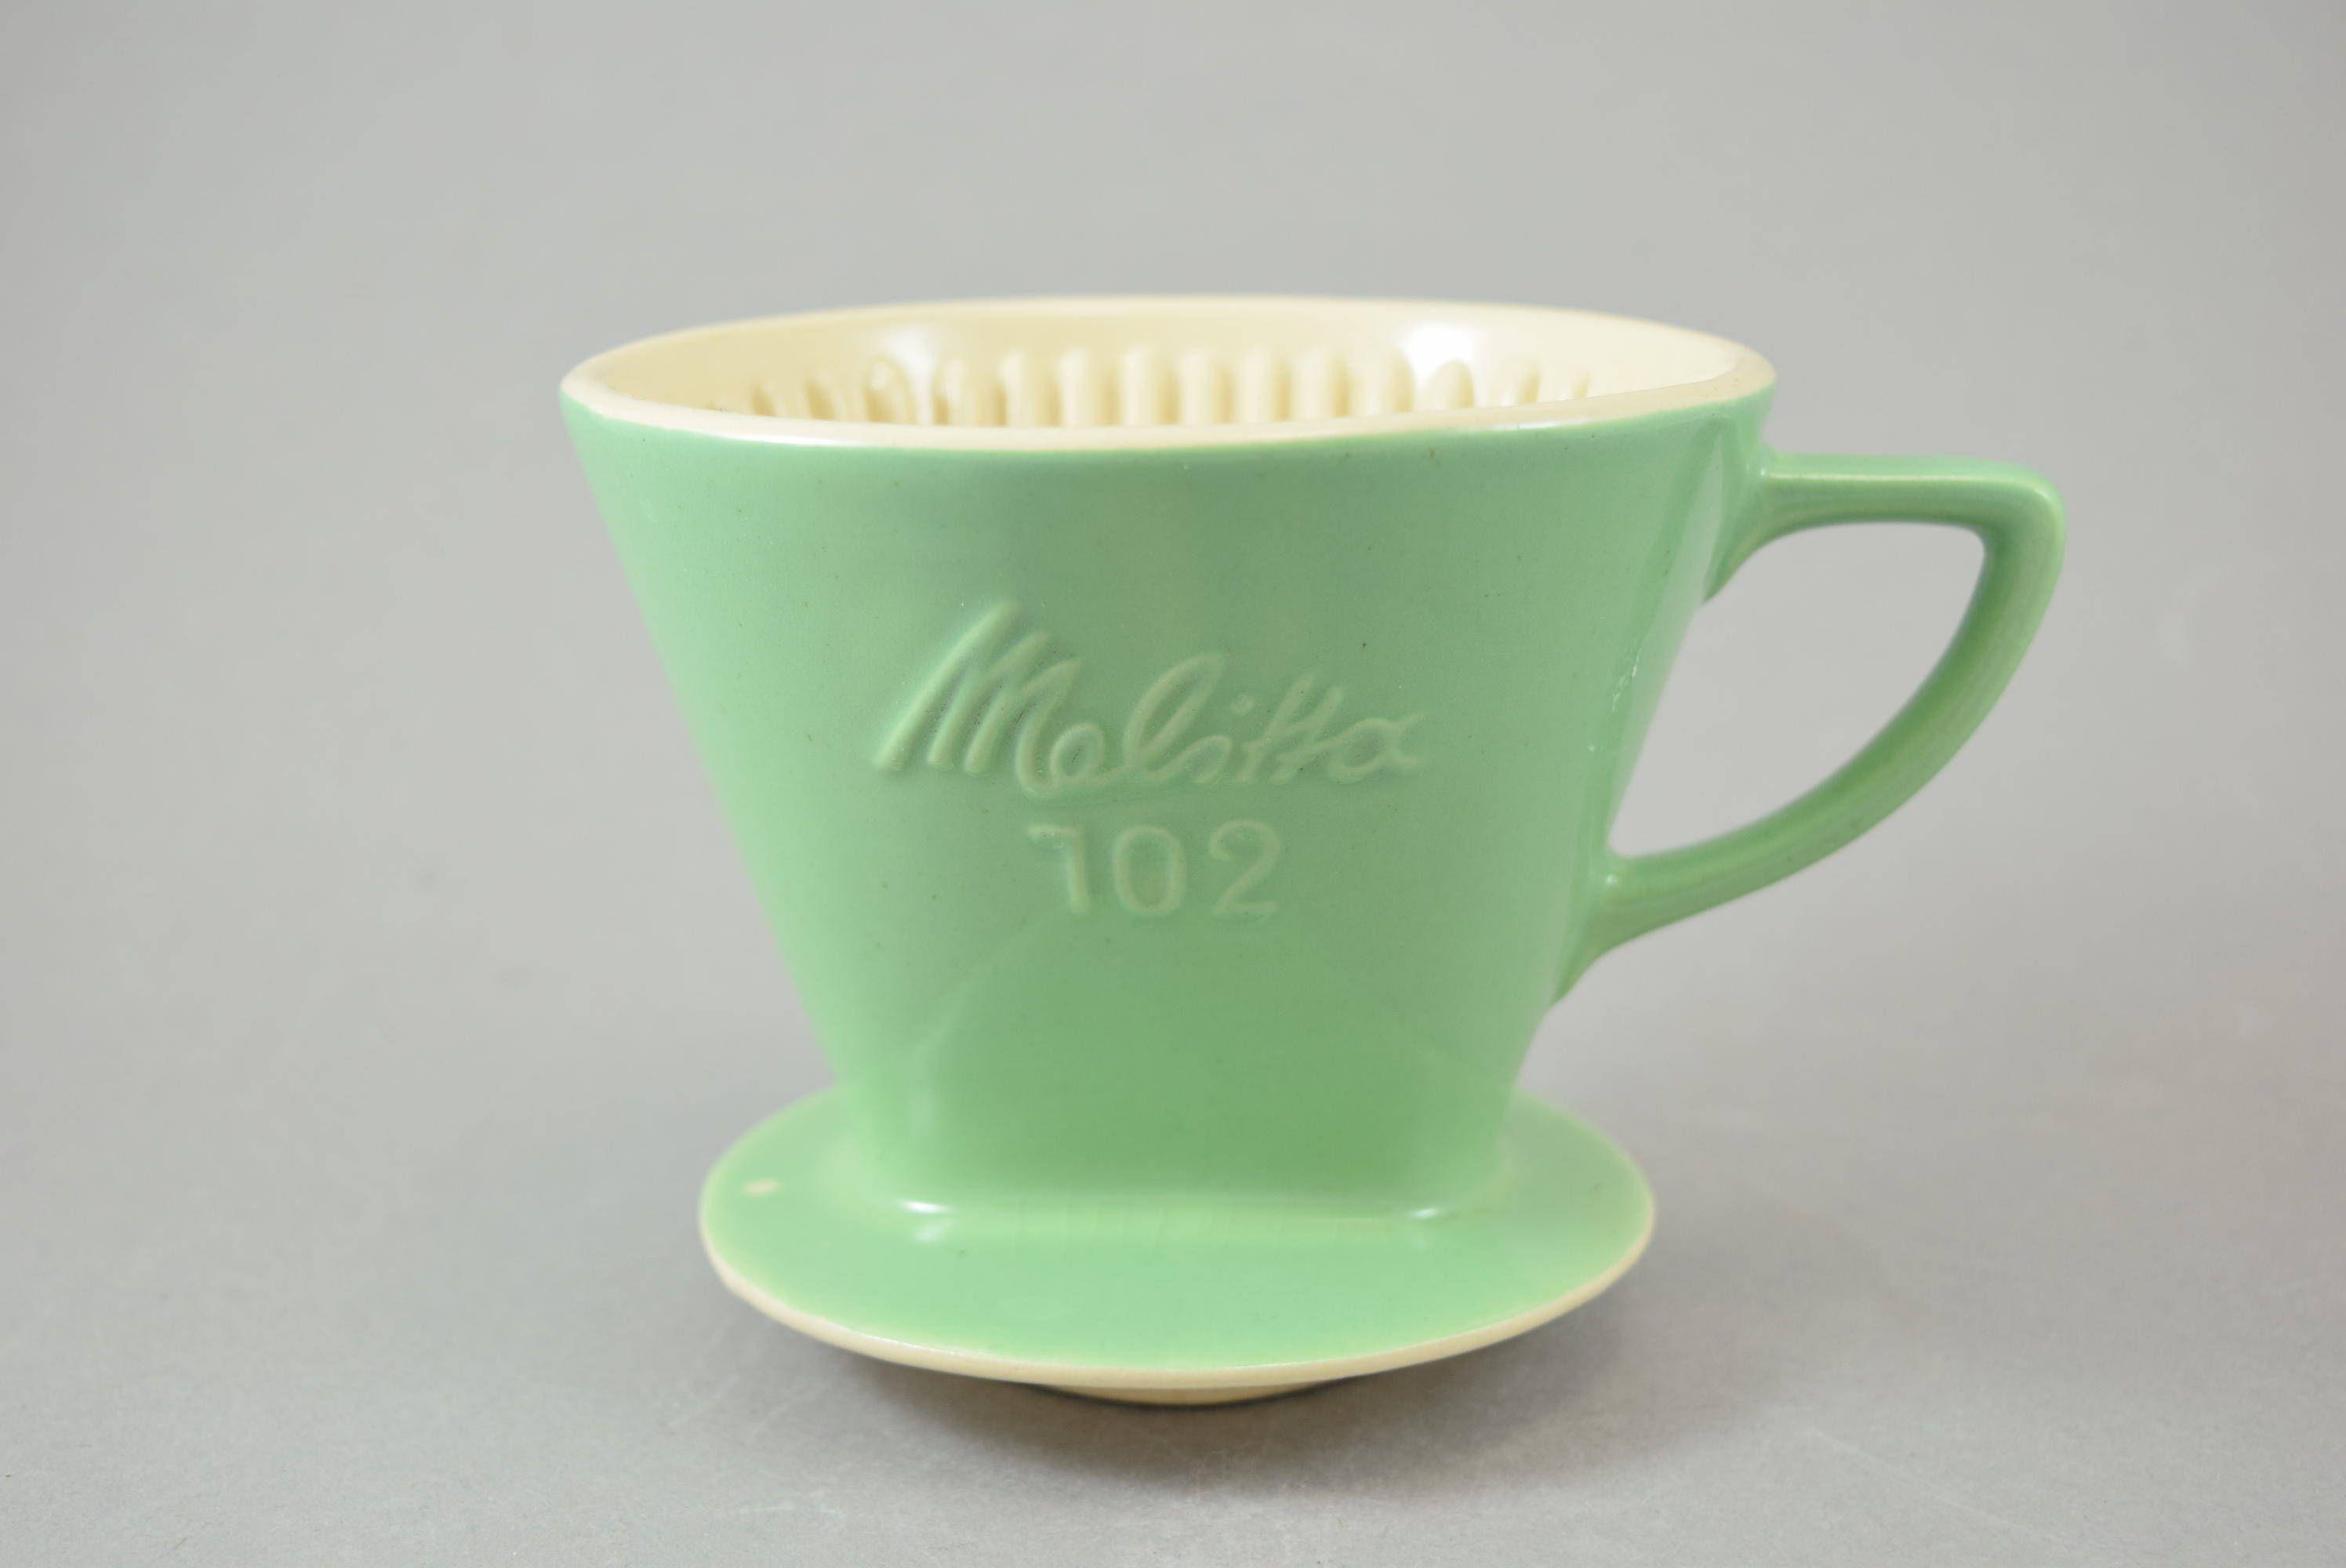 vintage melitta coffee filter 102 green mint mid century germany retro kitchen shabbrock on. Black Bedroom Furniture Sets. Home Design Ideas